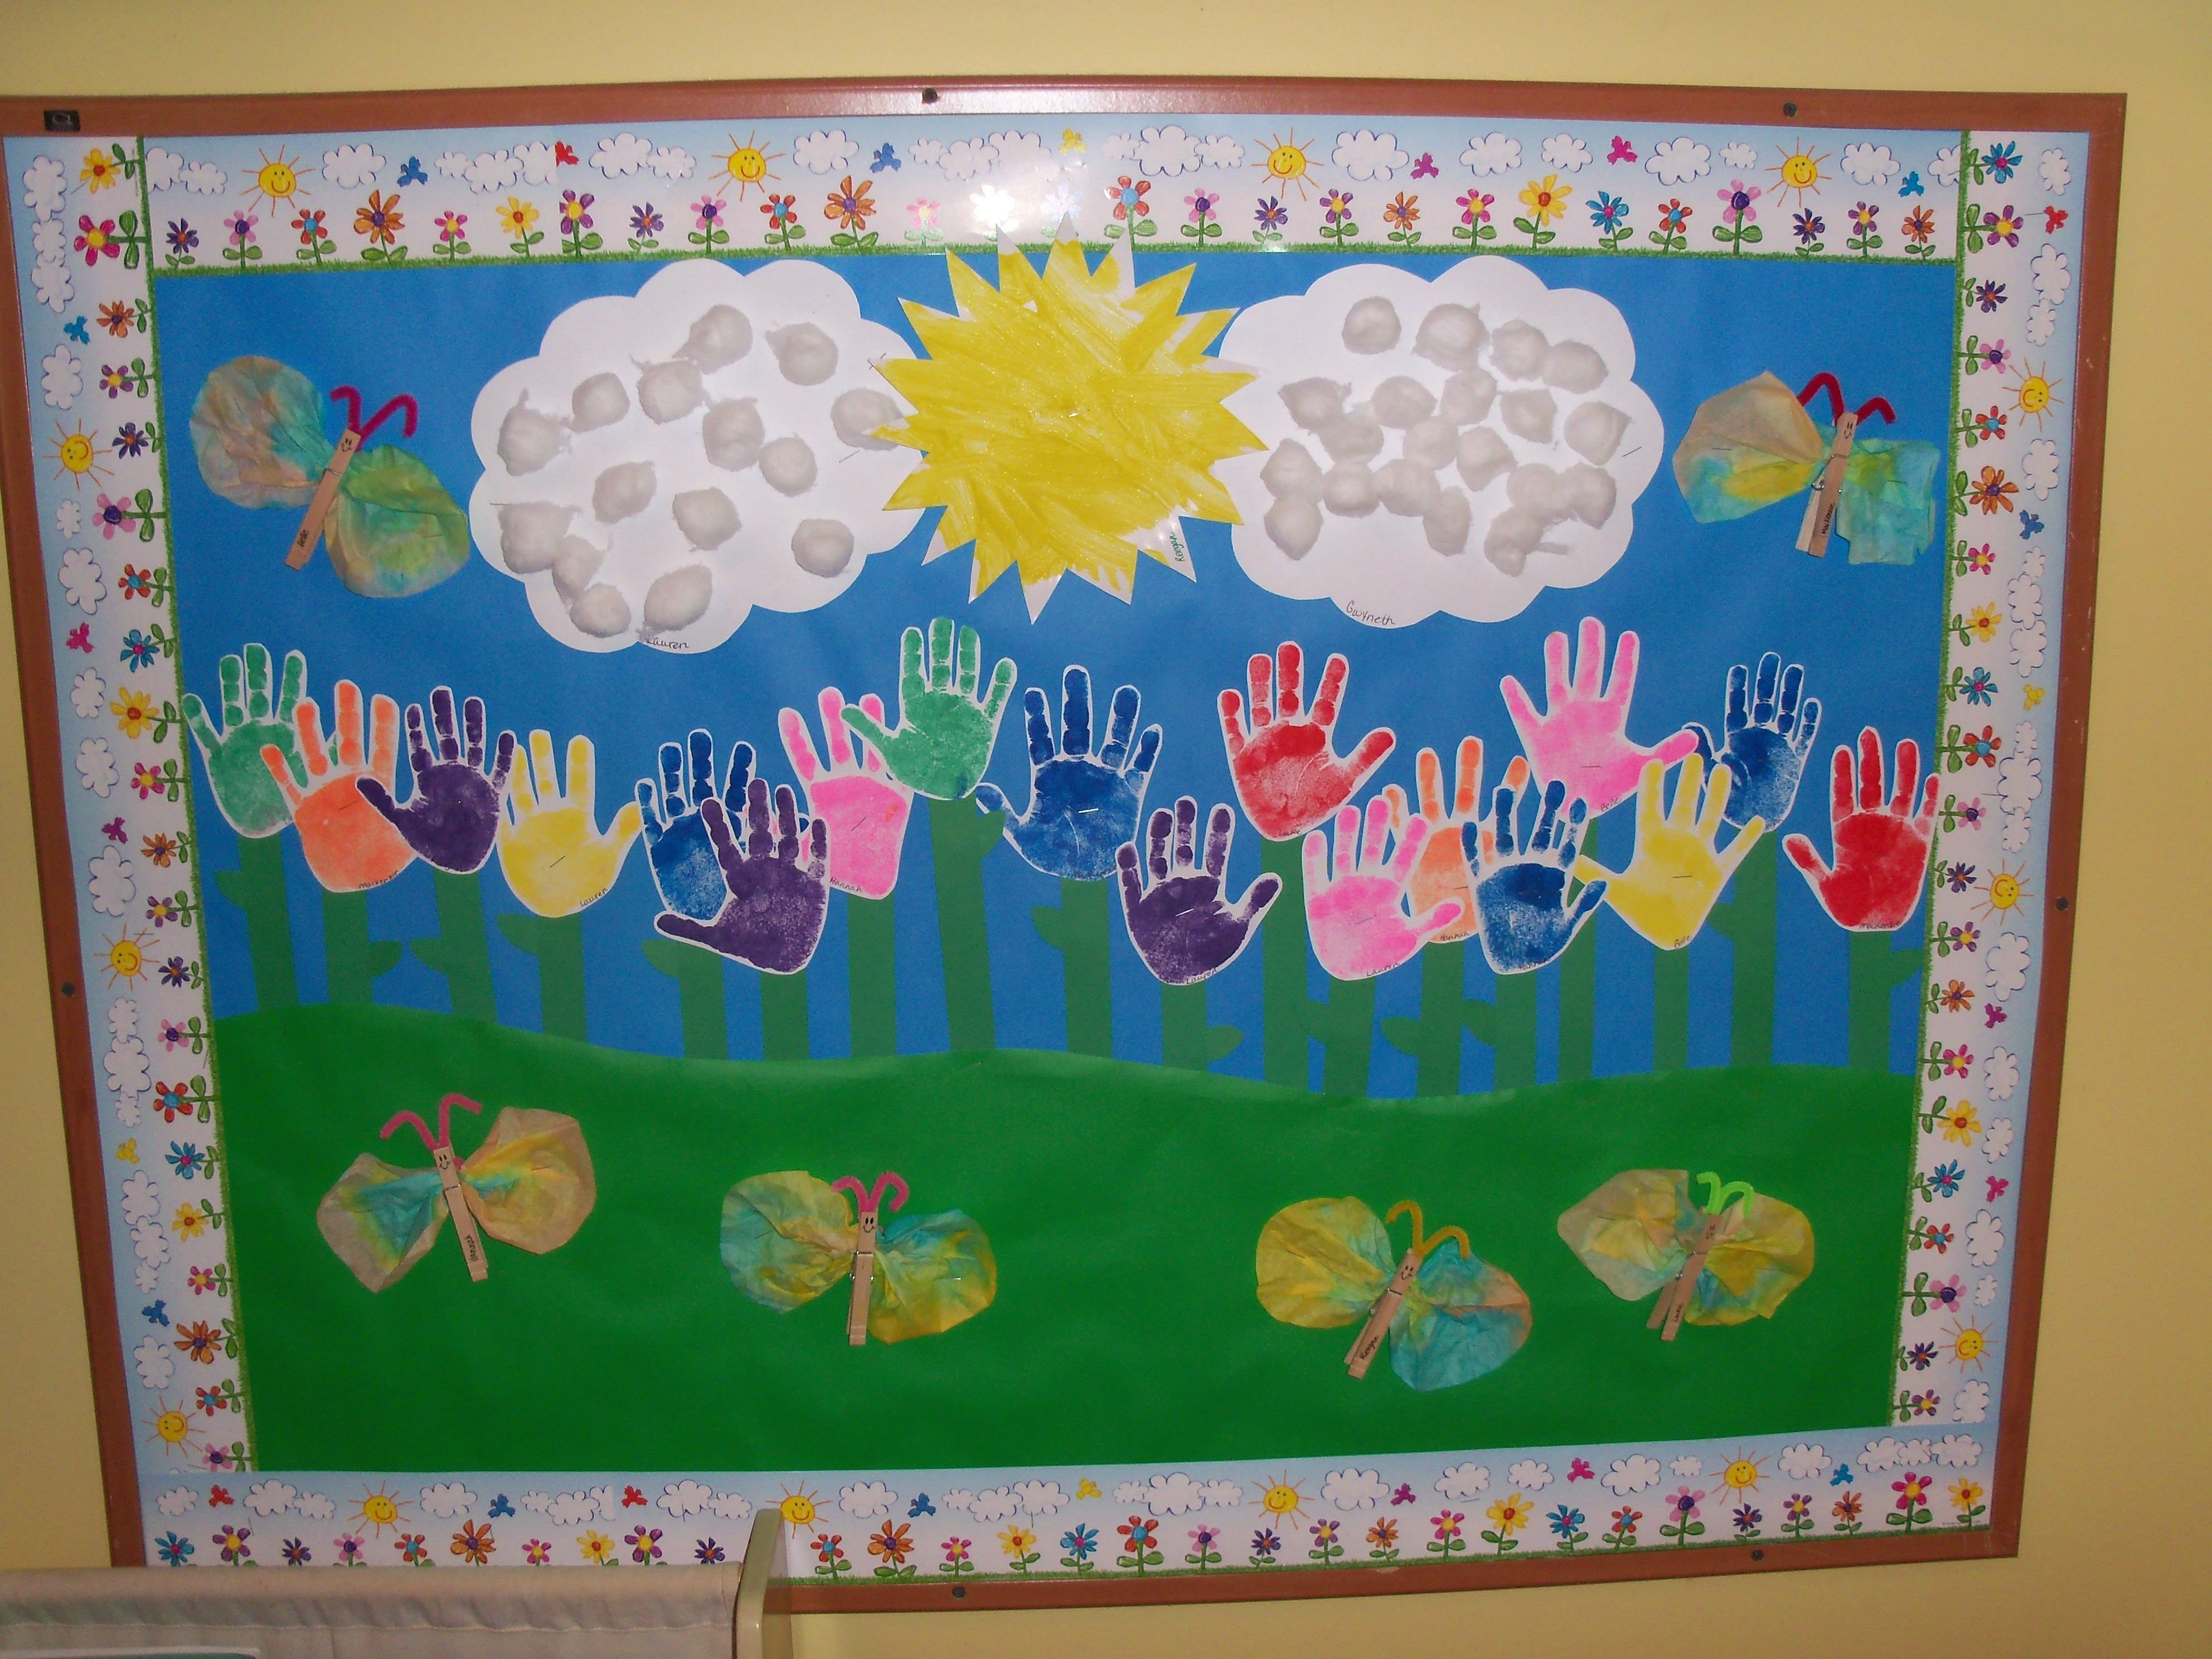 10 Lovable Preschool Spring Bulletin Board Ideas preschool spring bulletin board looks like fun for my daycare 2020